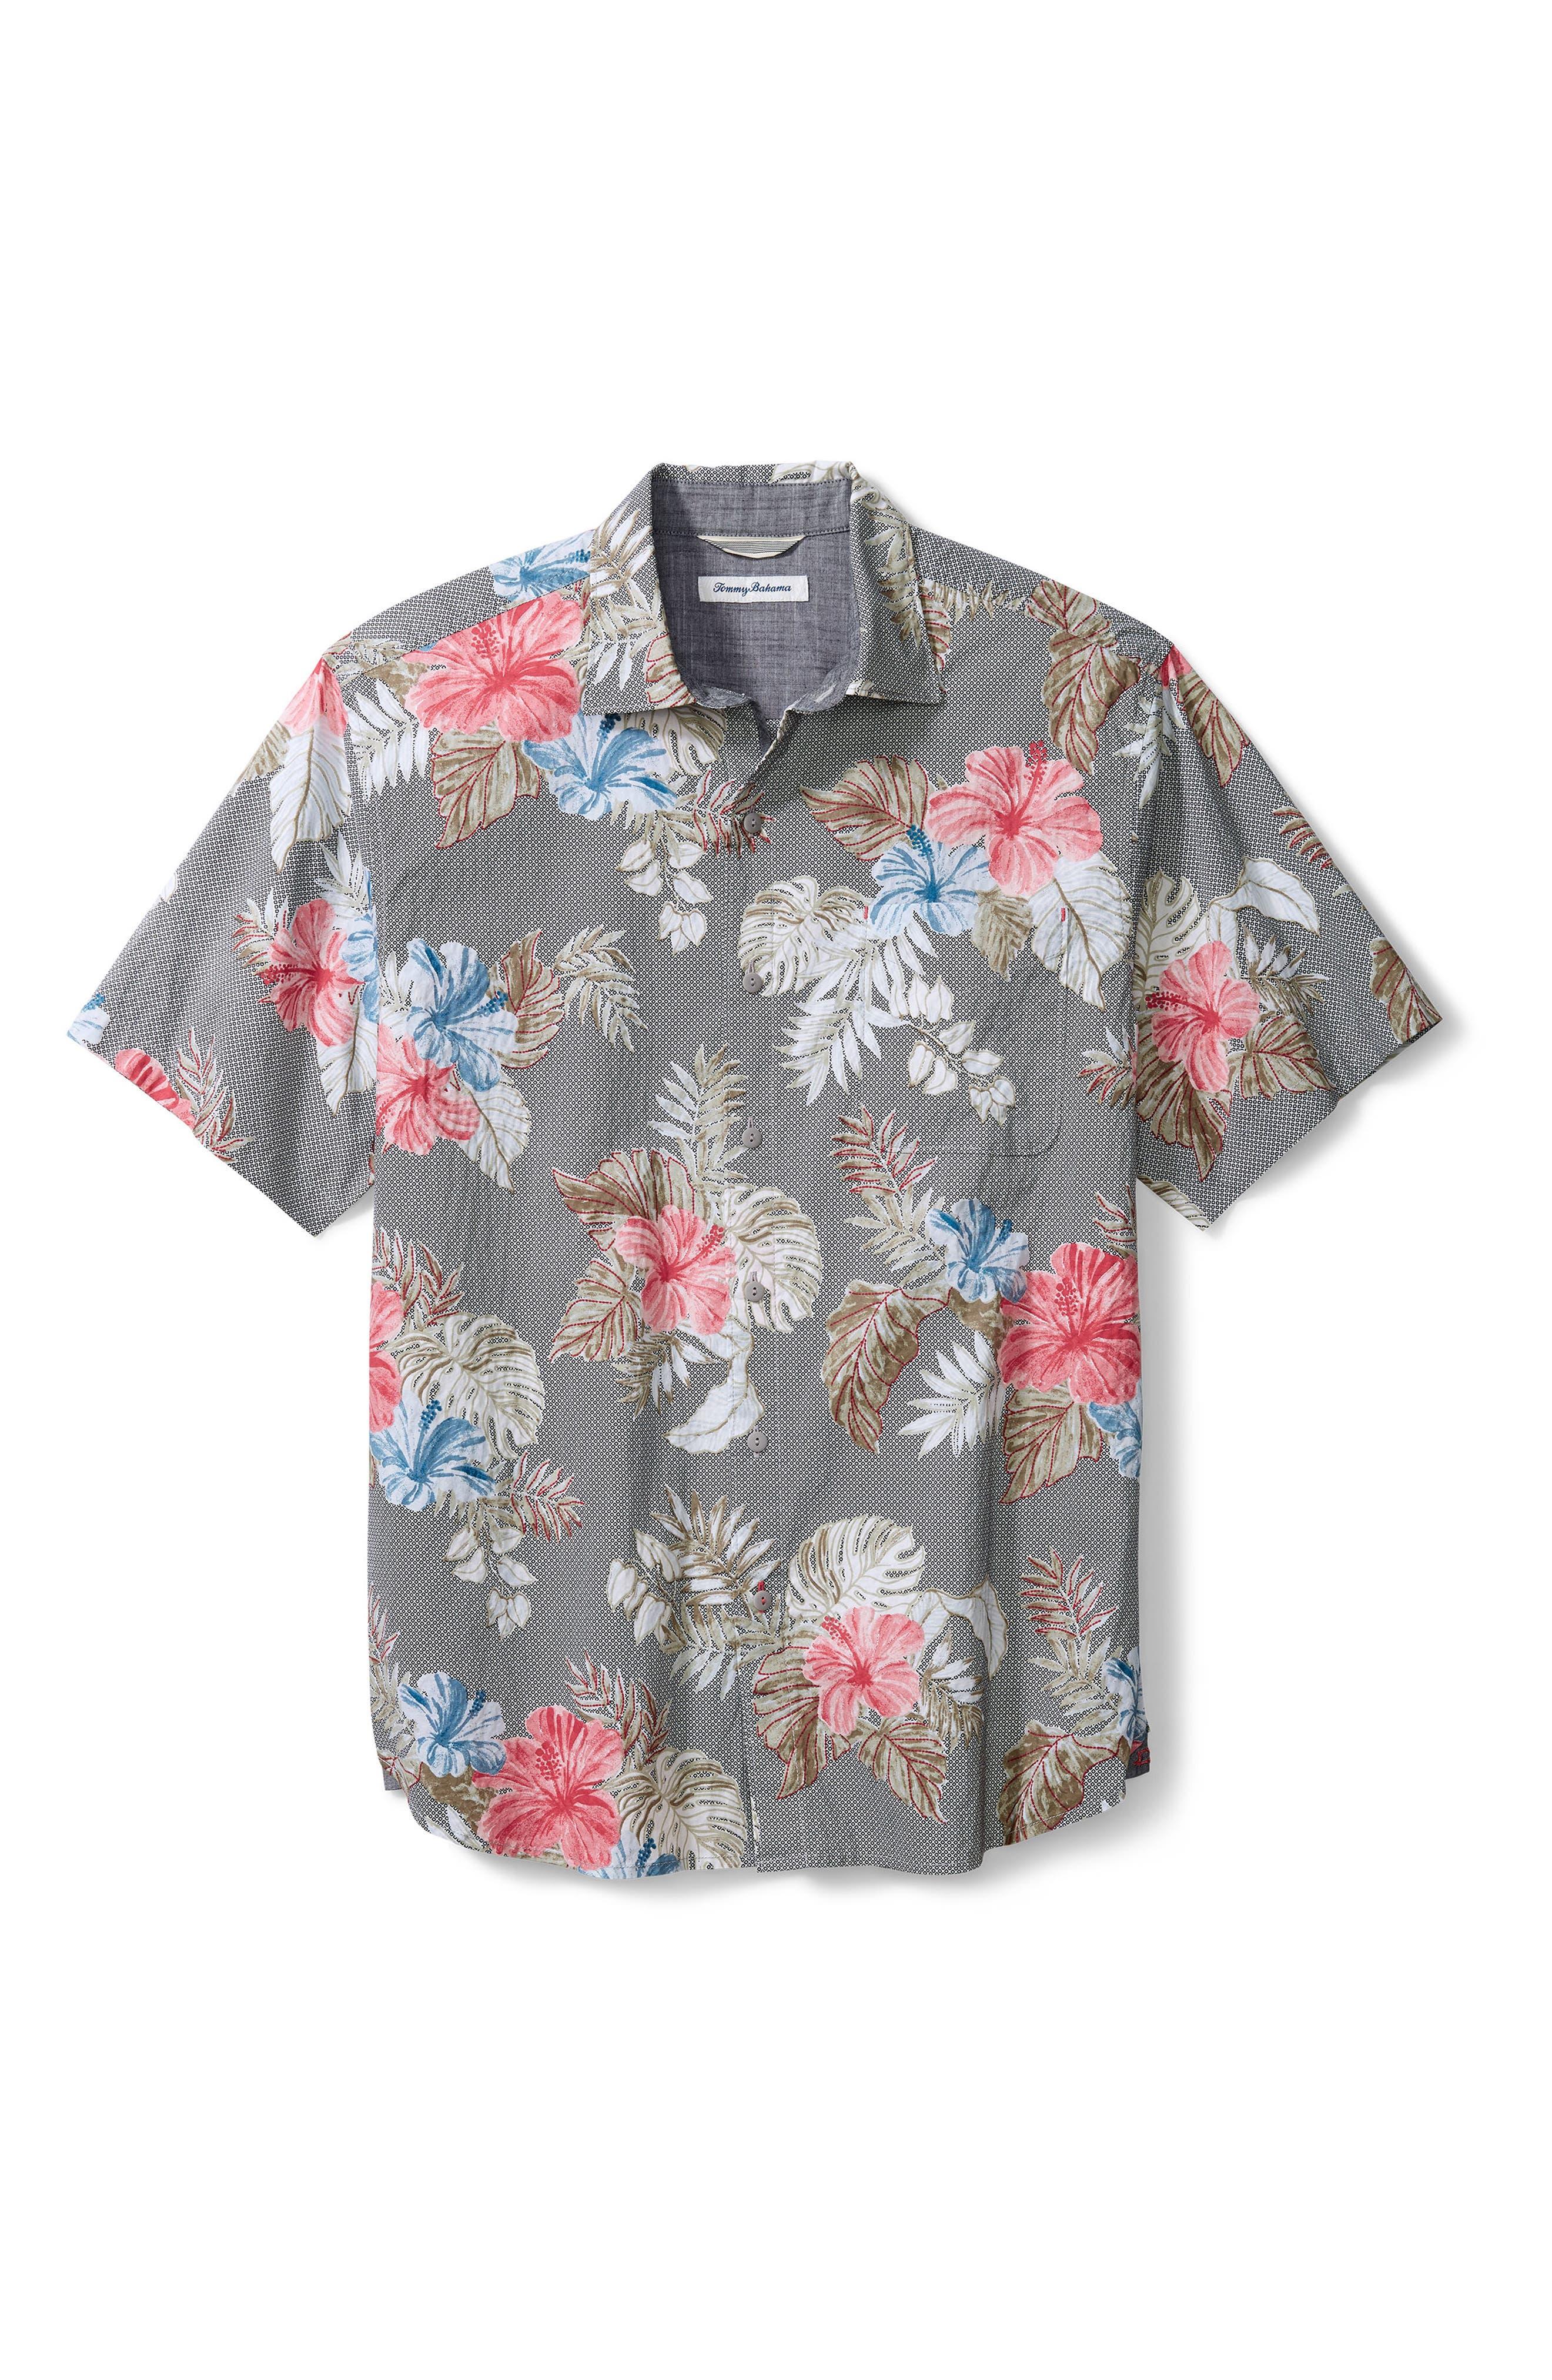 Men's Big & Tall Tommy Bahama Bora Bora Button-Up Shirt